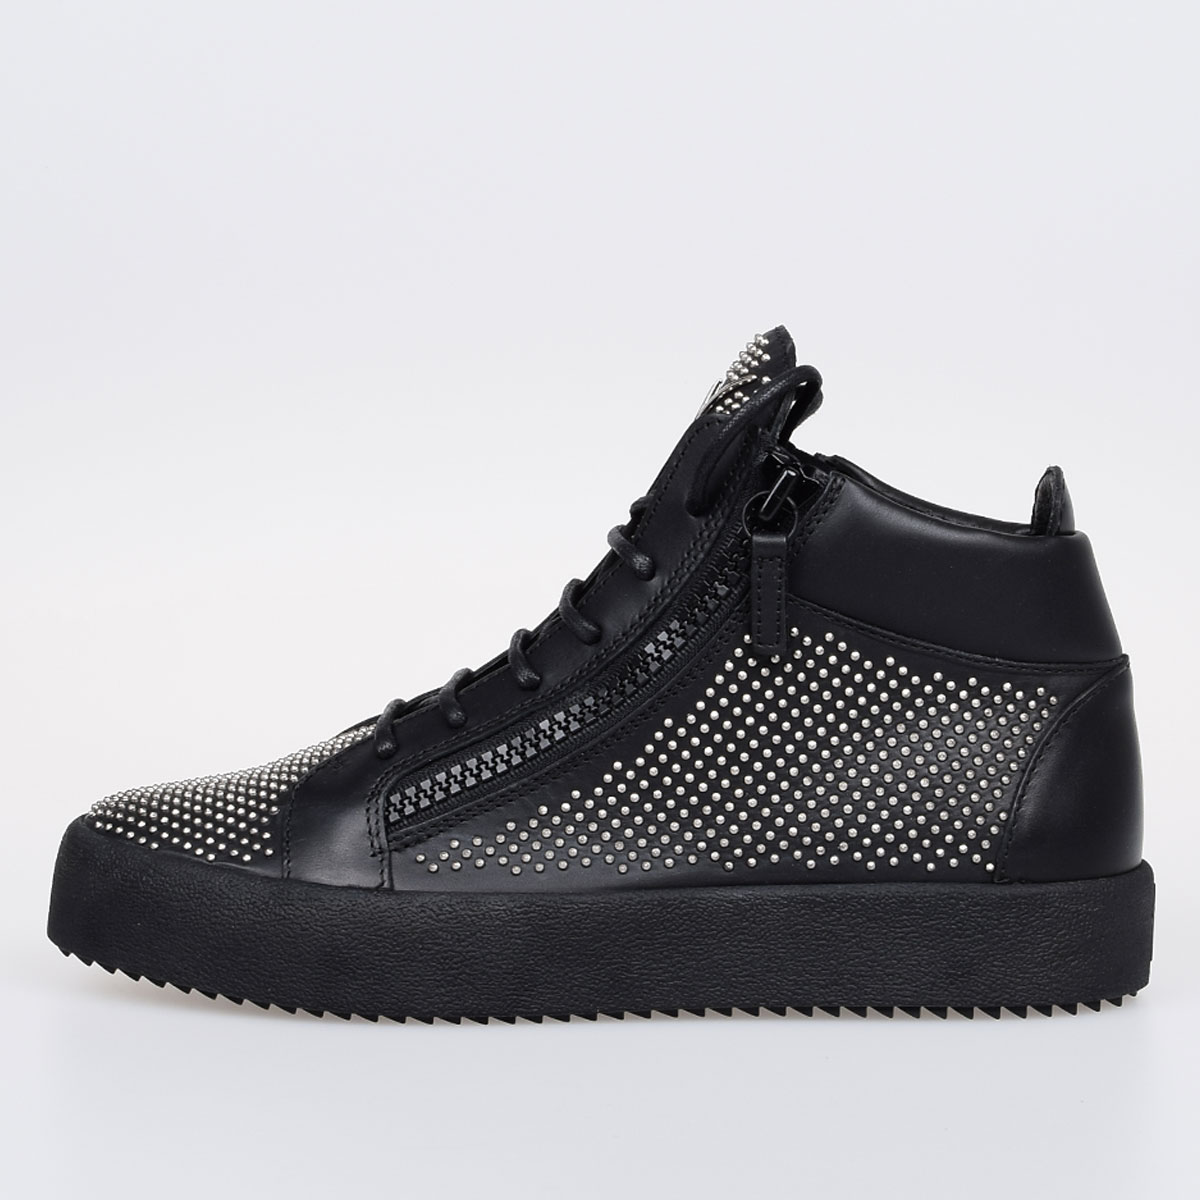 da44413386ca Giuseppe Zanotti Men MAY LONDON Studded Leather Sneakers - Glamood ...